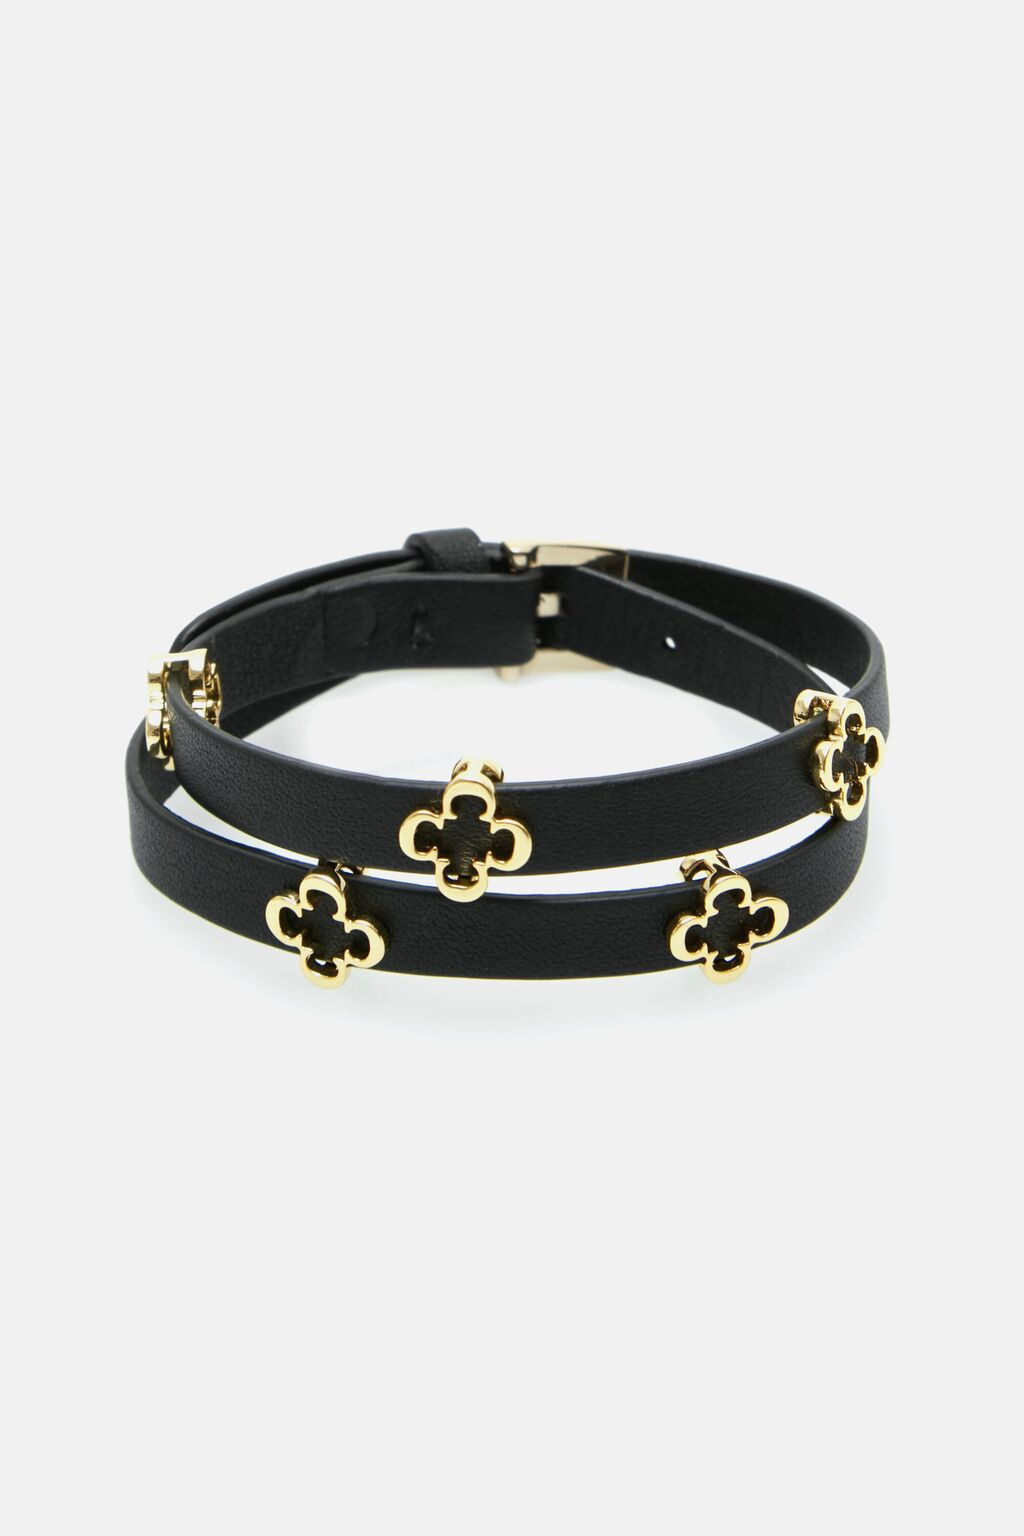 Rosetta Insignia leather bracelet